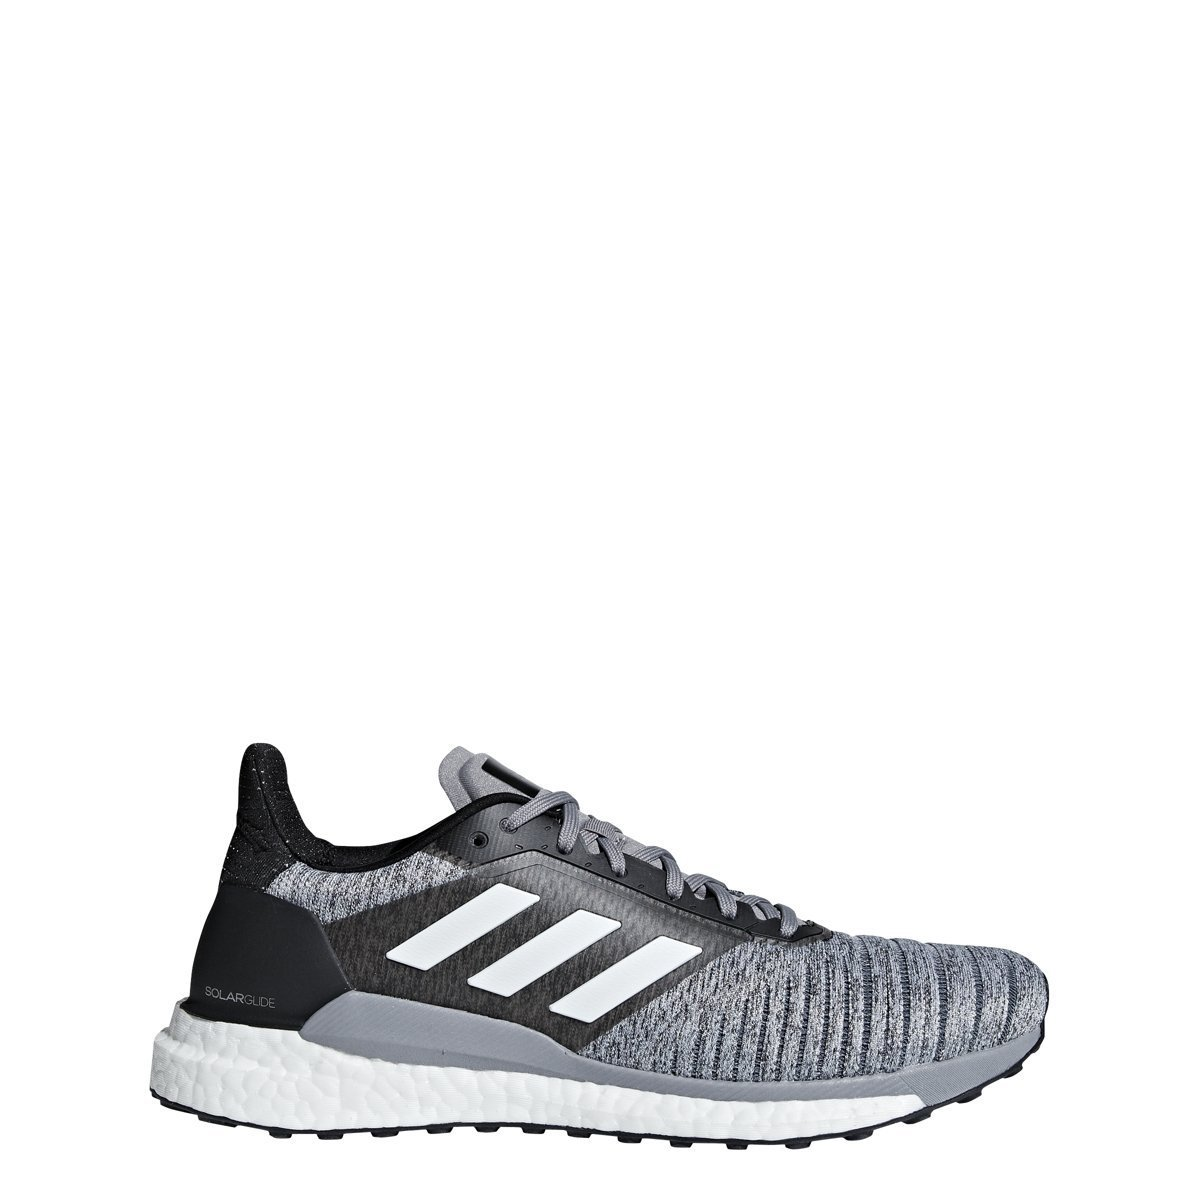 adidas Originals Men's Solar Glide Running Shoe B07B8MBLG1 10.5 D(M) US|White/White/Black